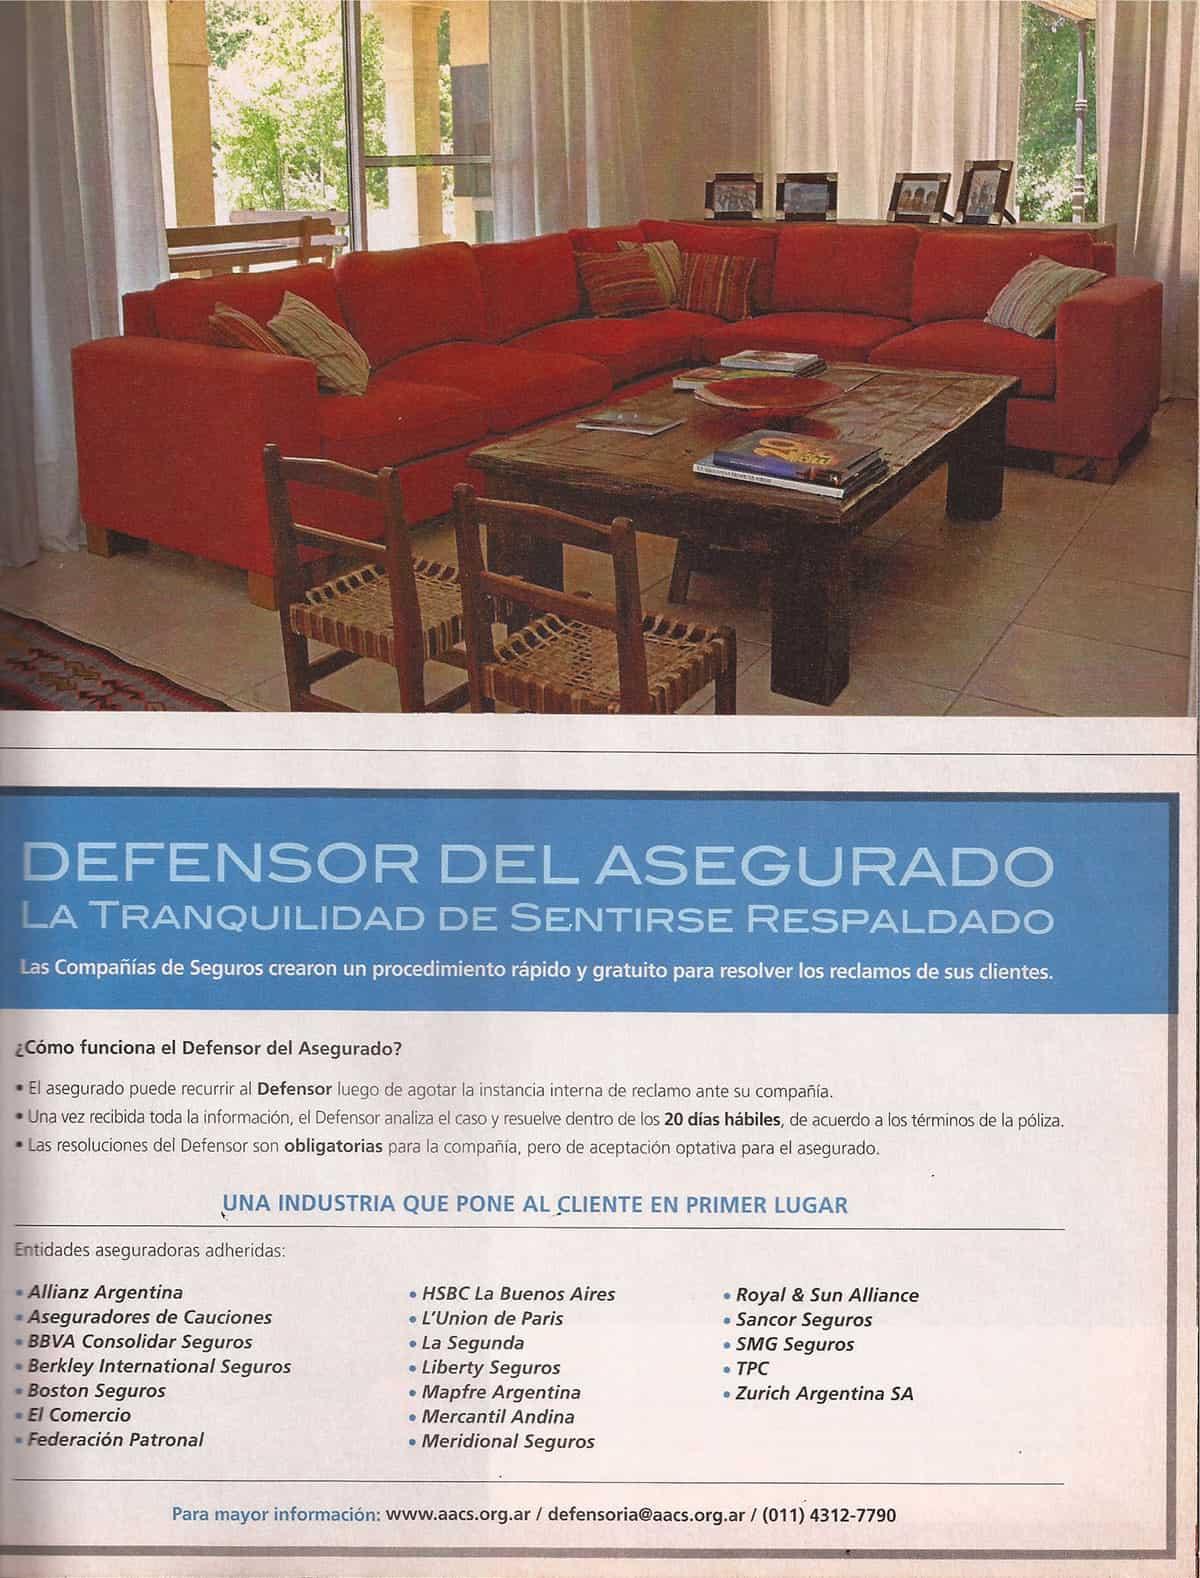 La Nacion Revista 01-2008 – 05